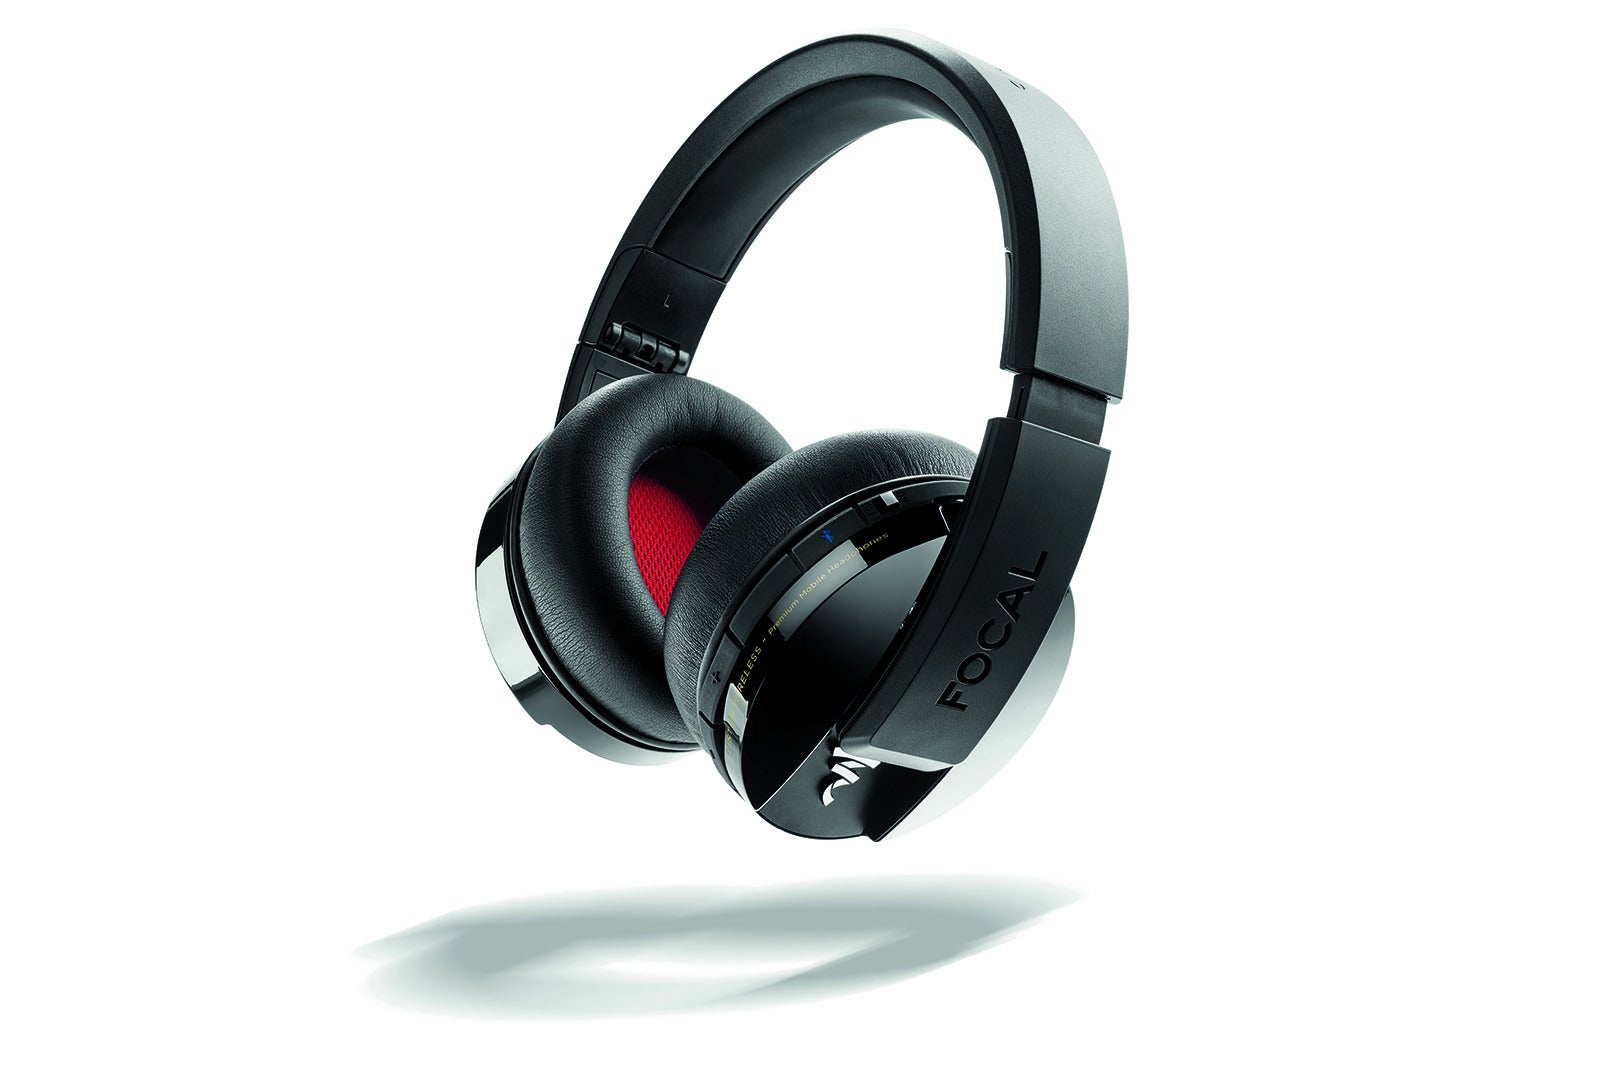 Focal Listen Wireless review | TechHive